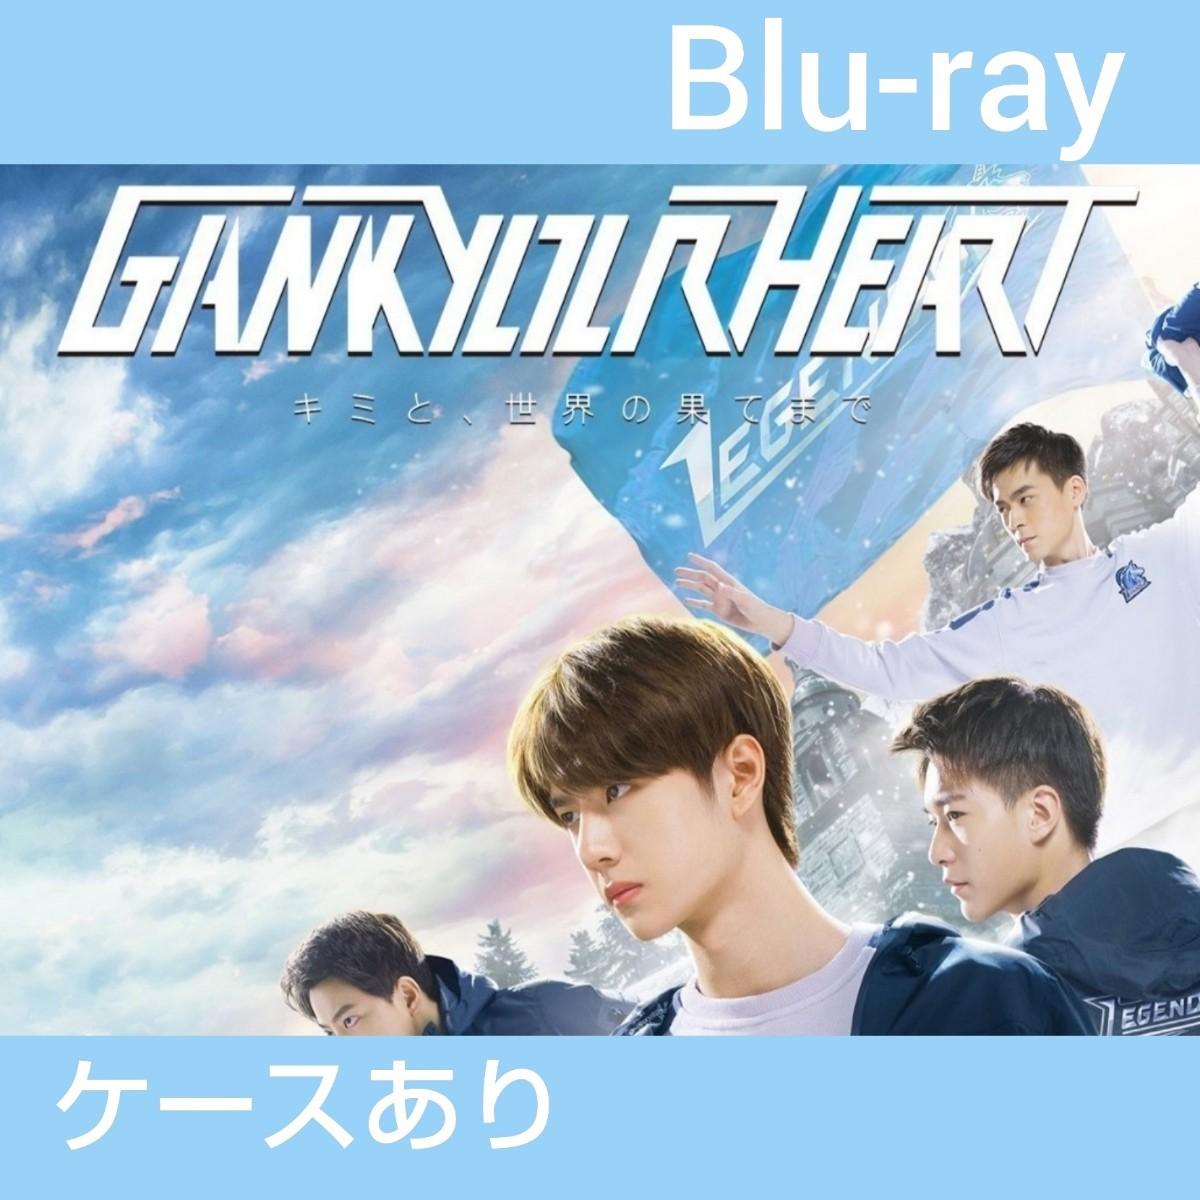 GANK YOUR HEART 全話 Blu-ray